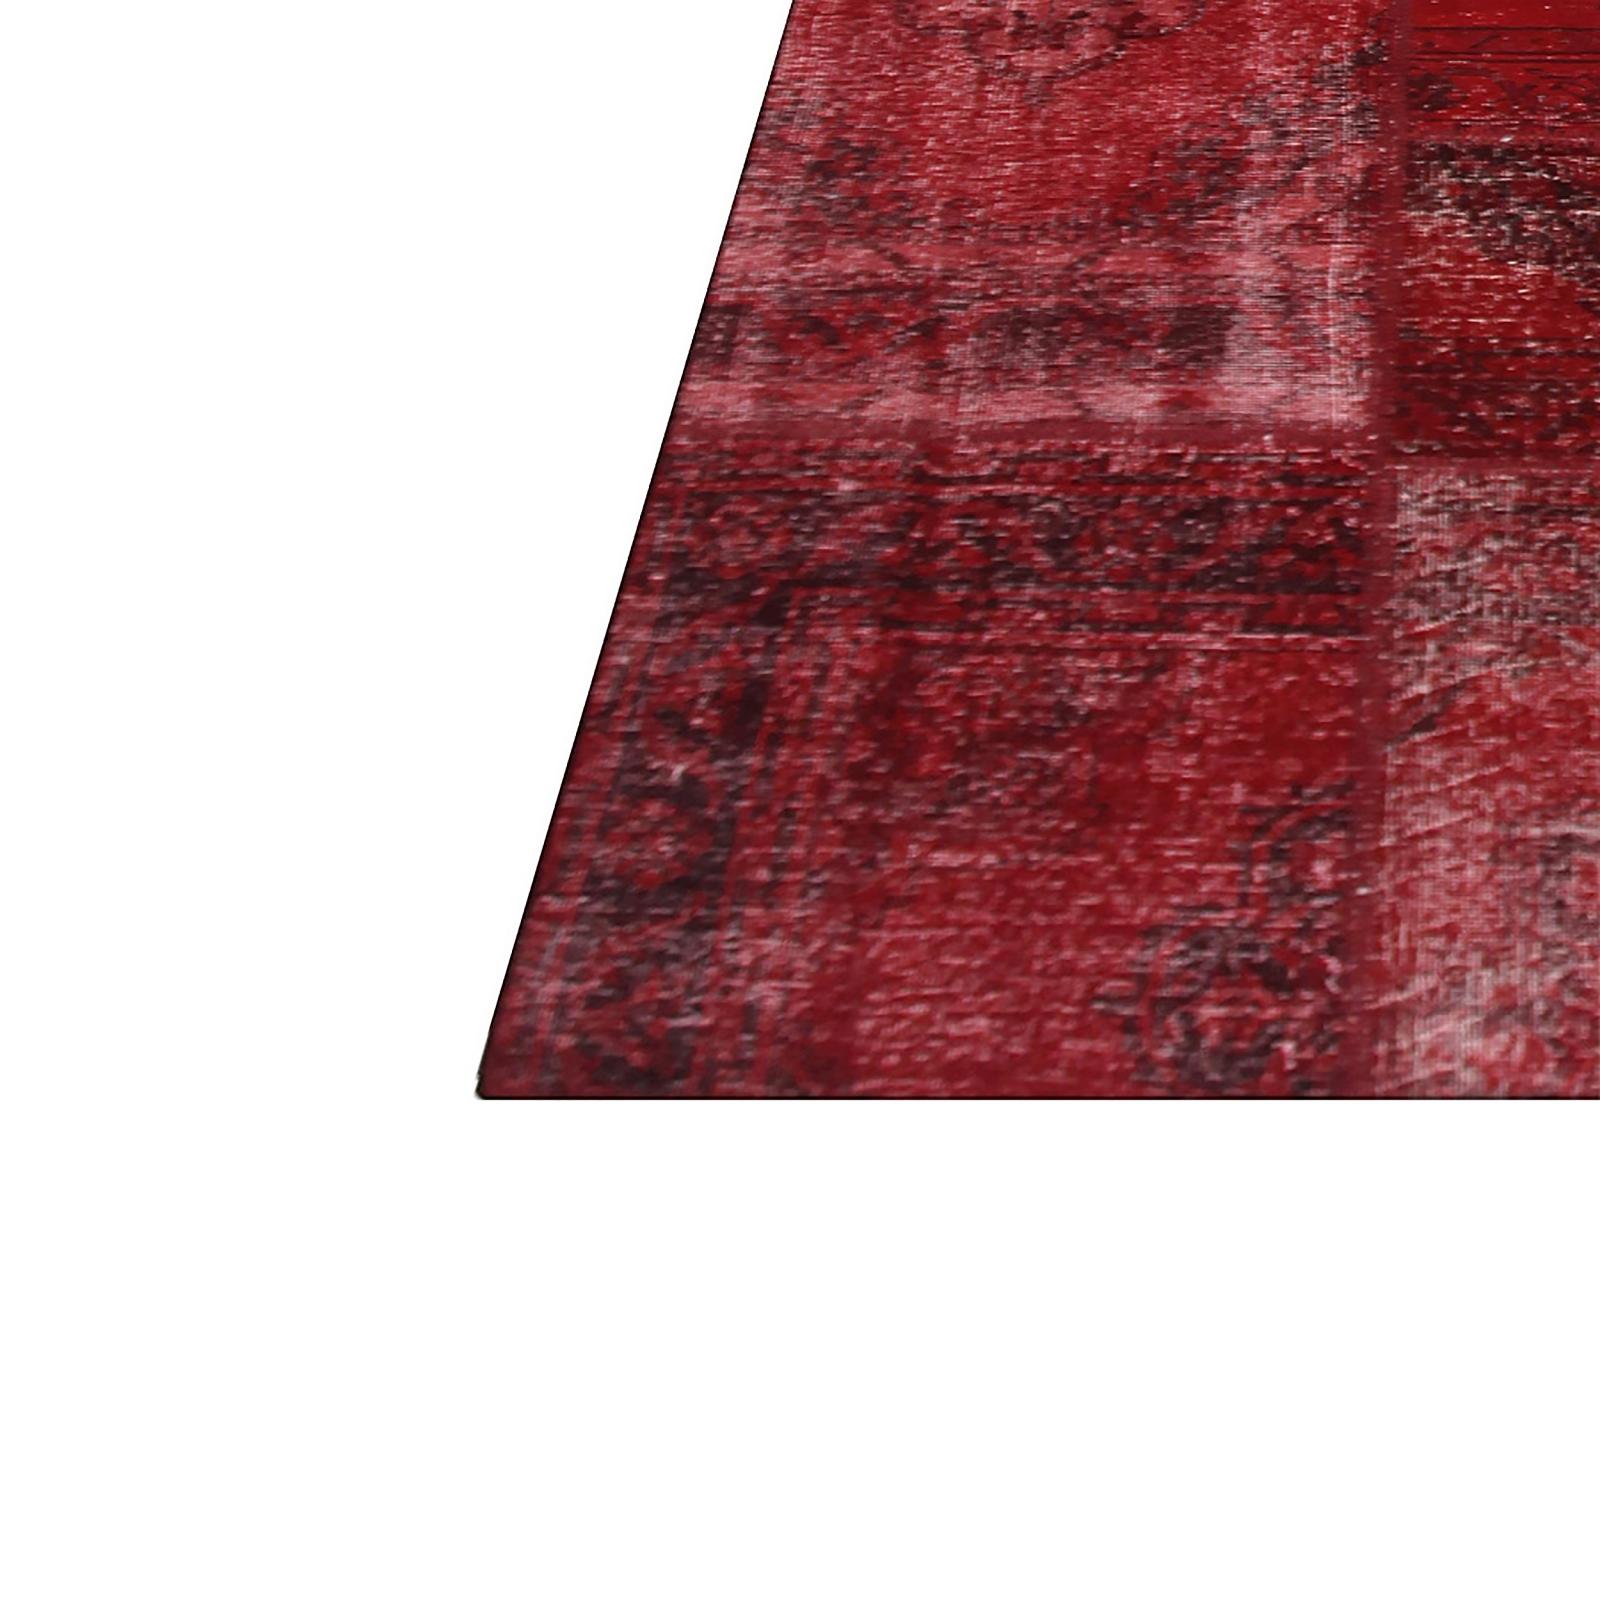 Teppich Patchwork Patchwork Teppich Orange Curry In 240x160cm 1001